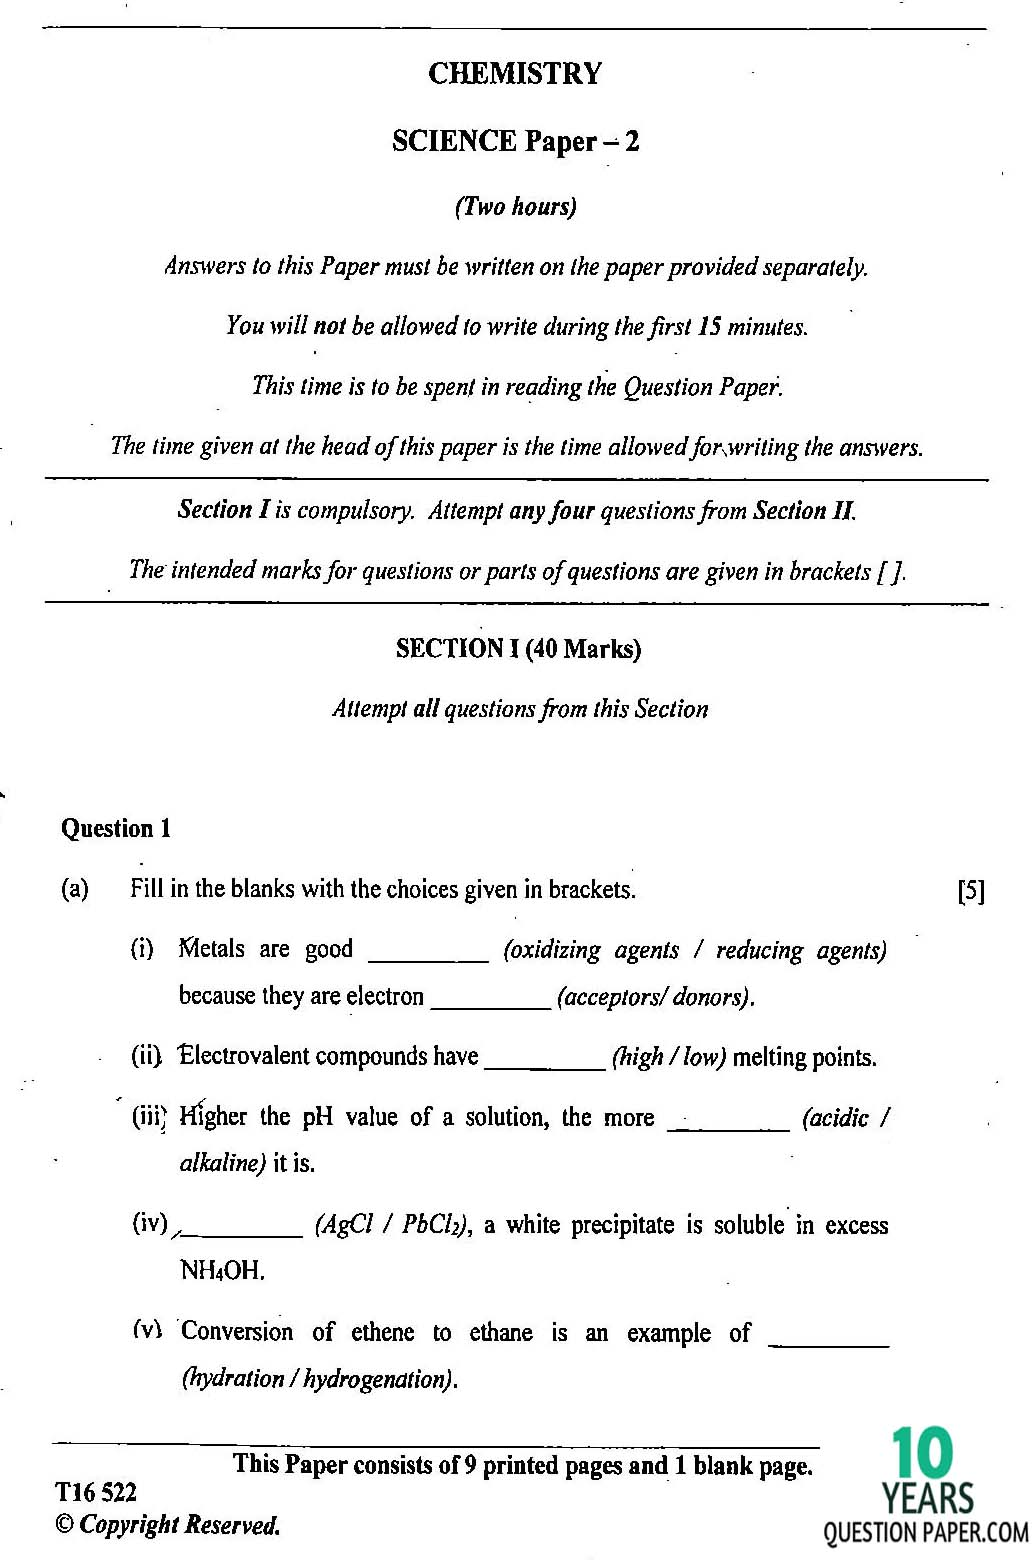 Icse Chemistry Science Paper 2 Class X